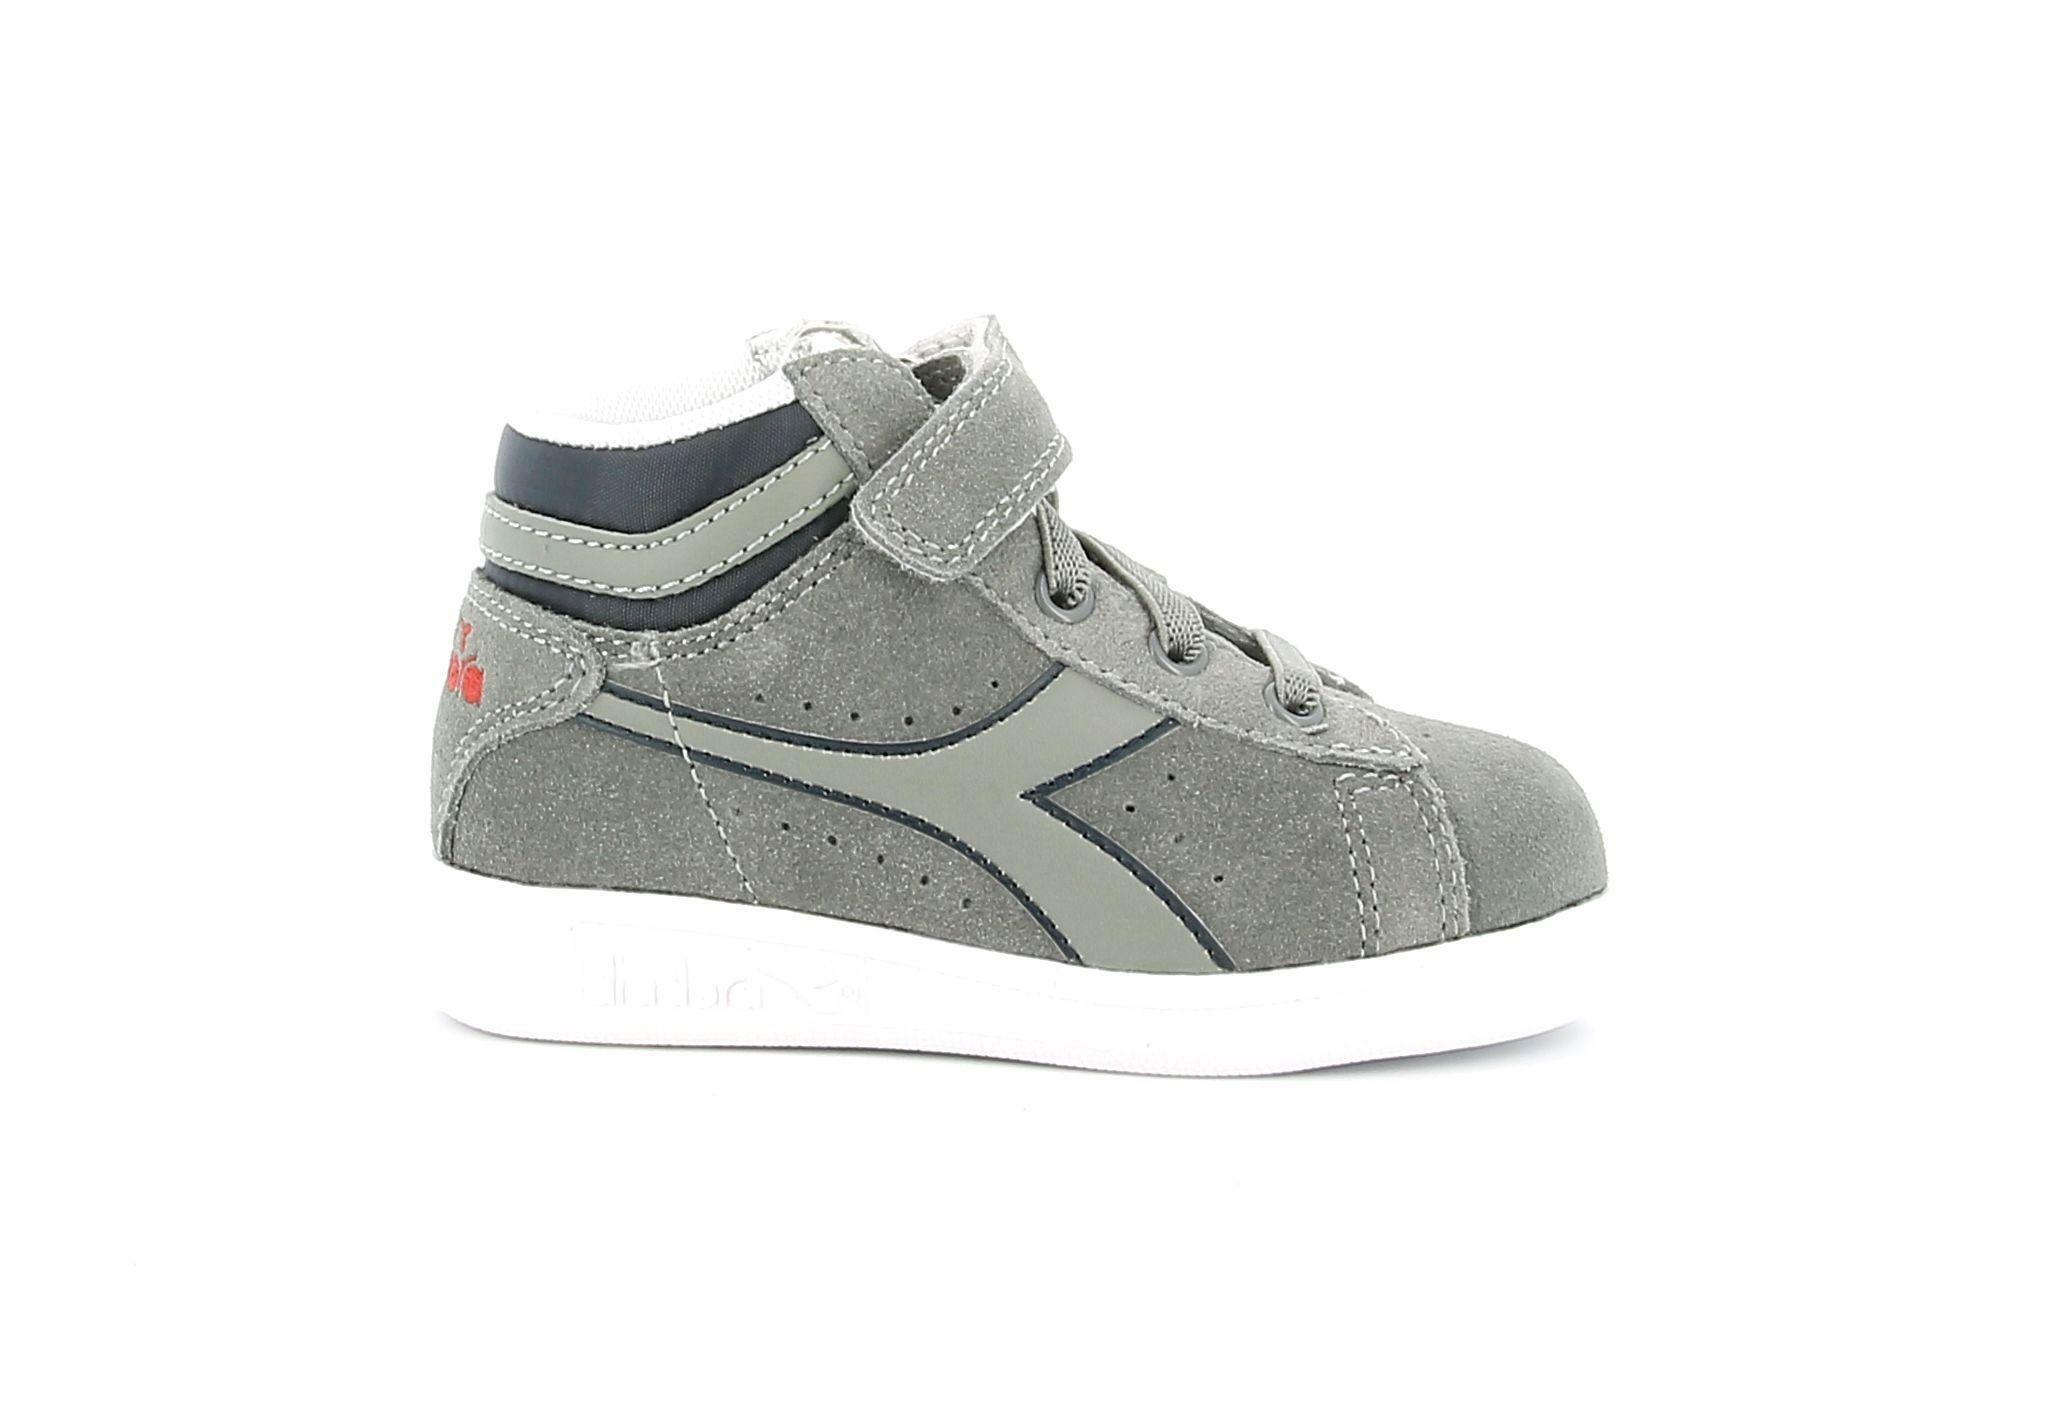 diadora diadora game s hight td grigio 173990 grigio scarpe da ginnastica bambino